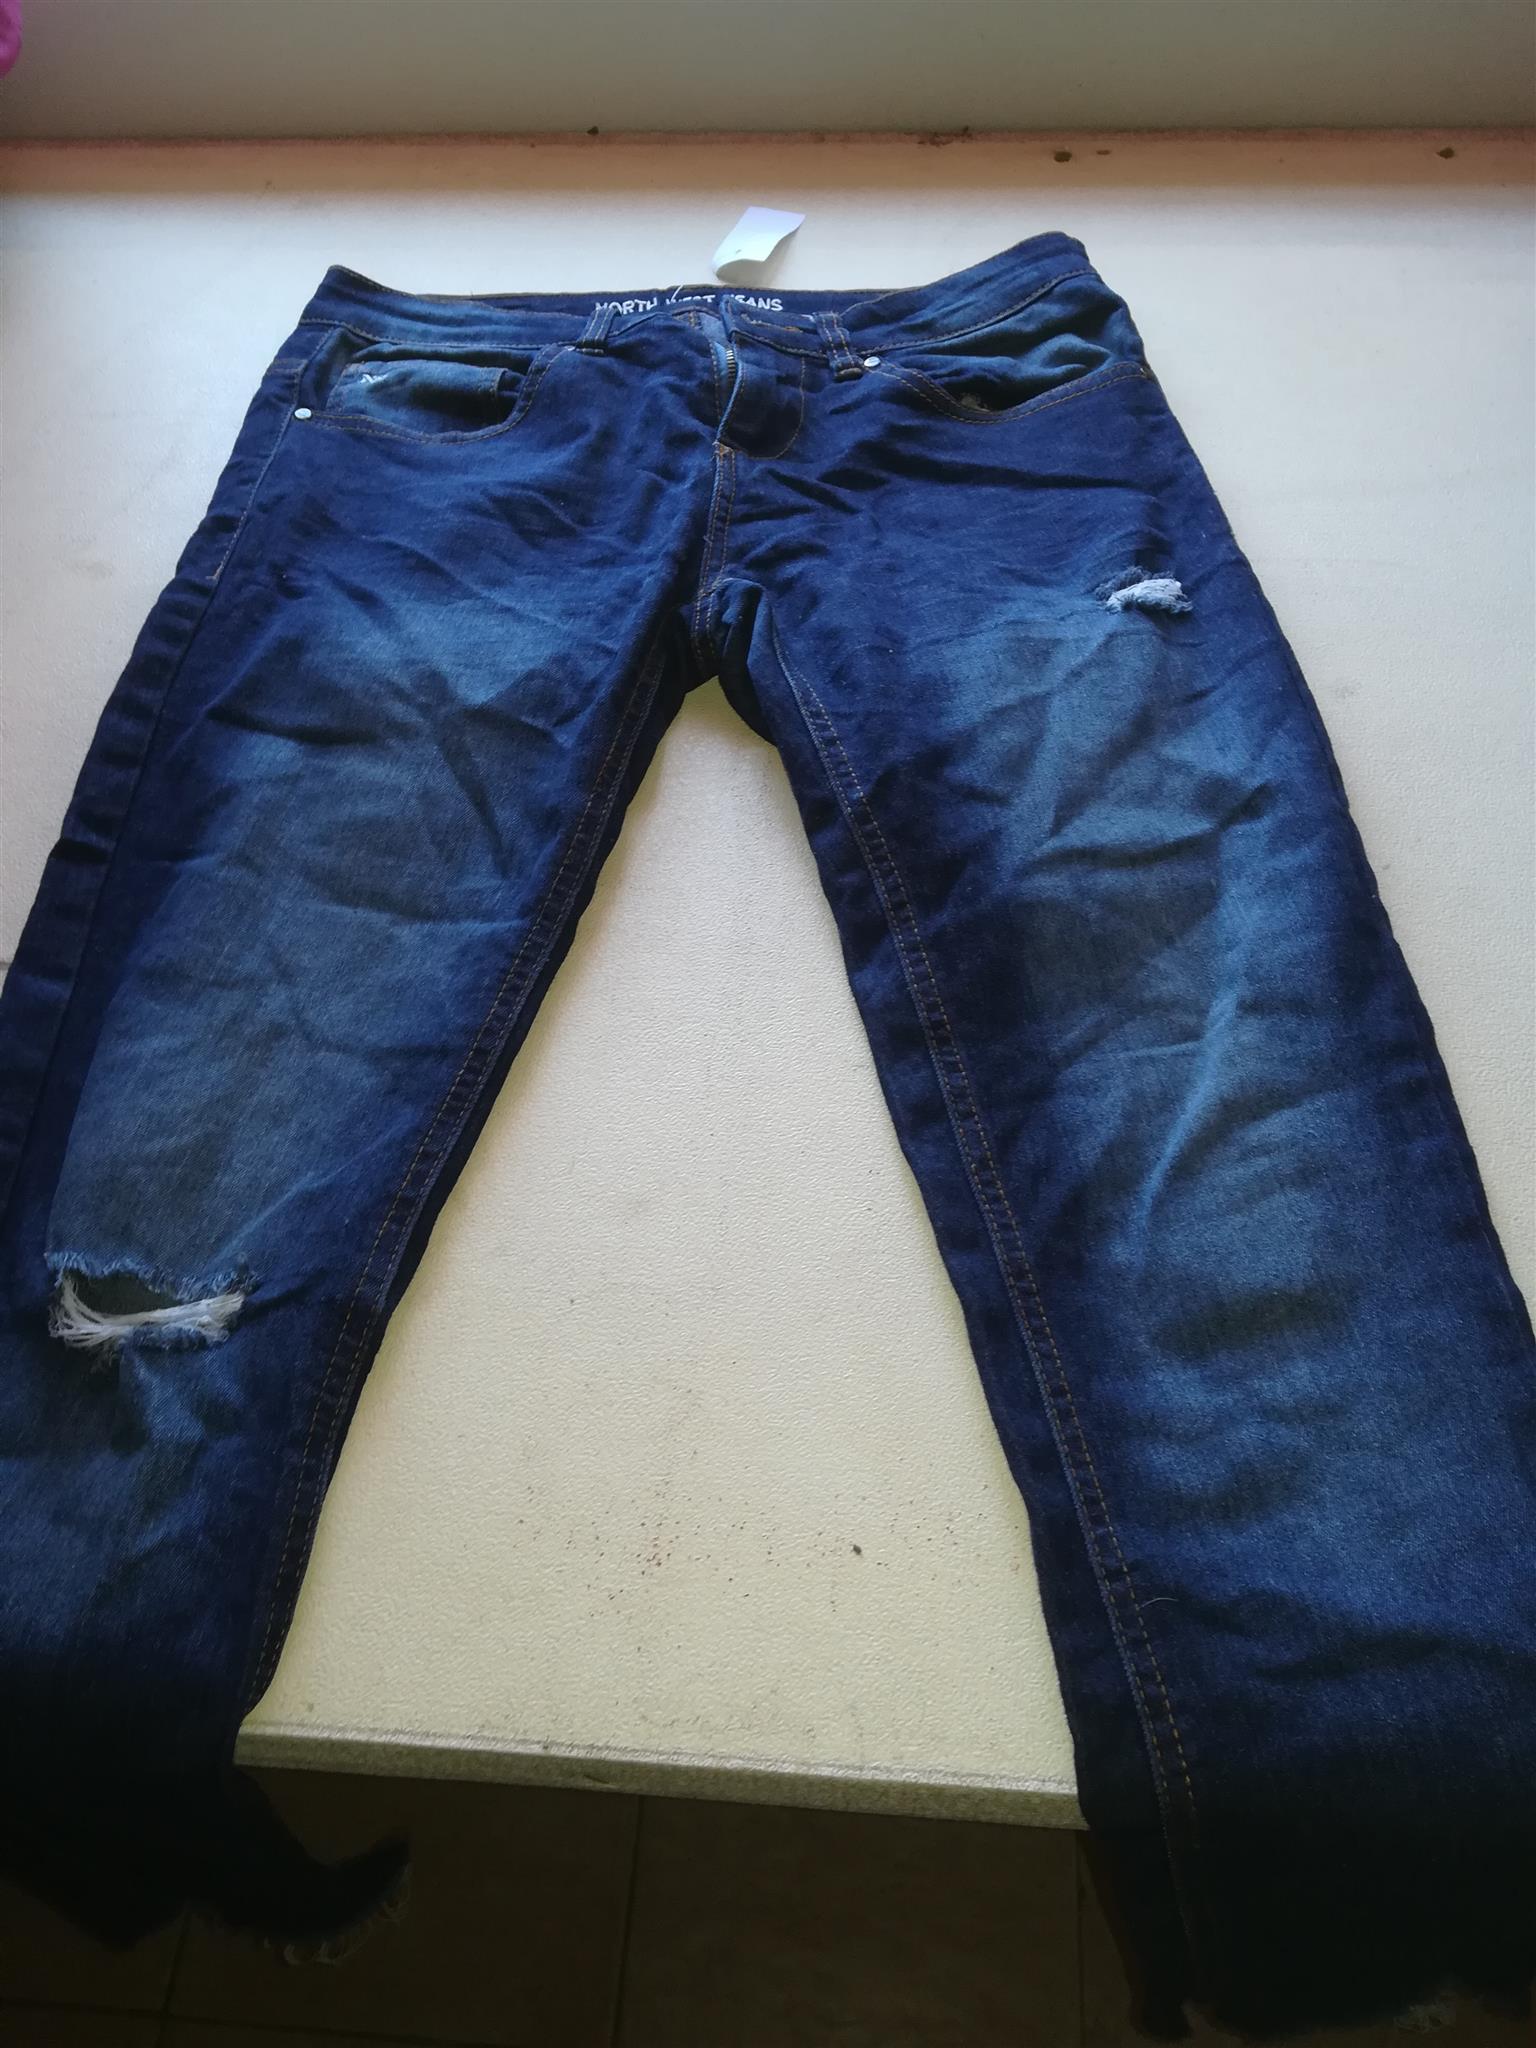 Jean pants in BALES! SALE